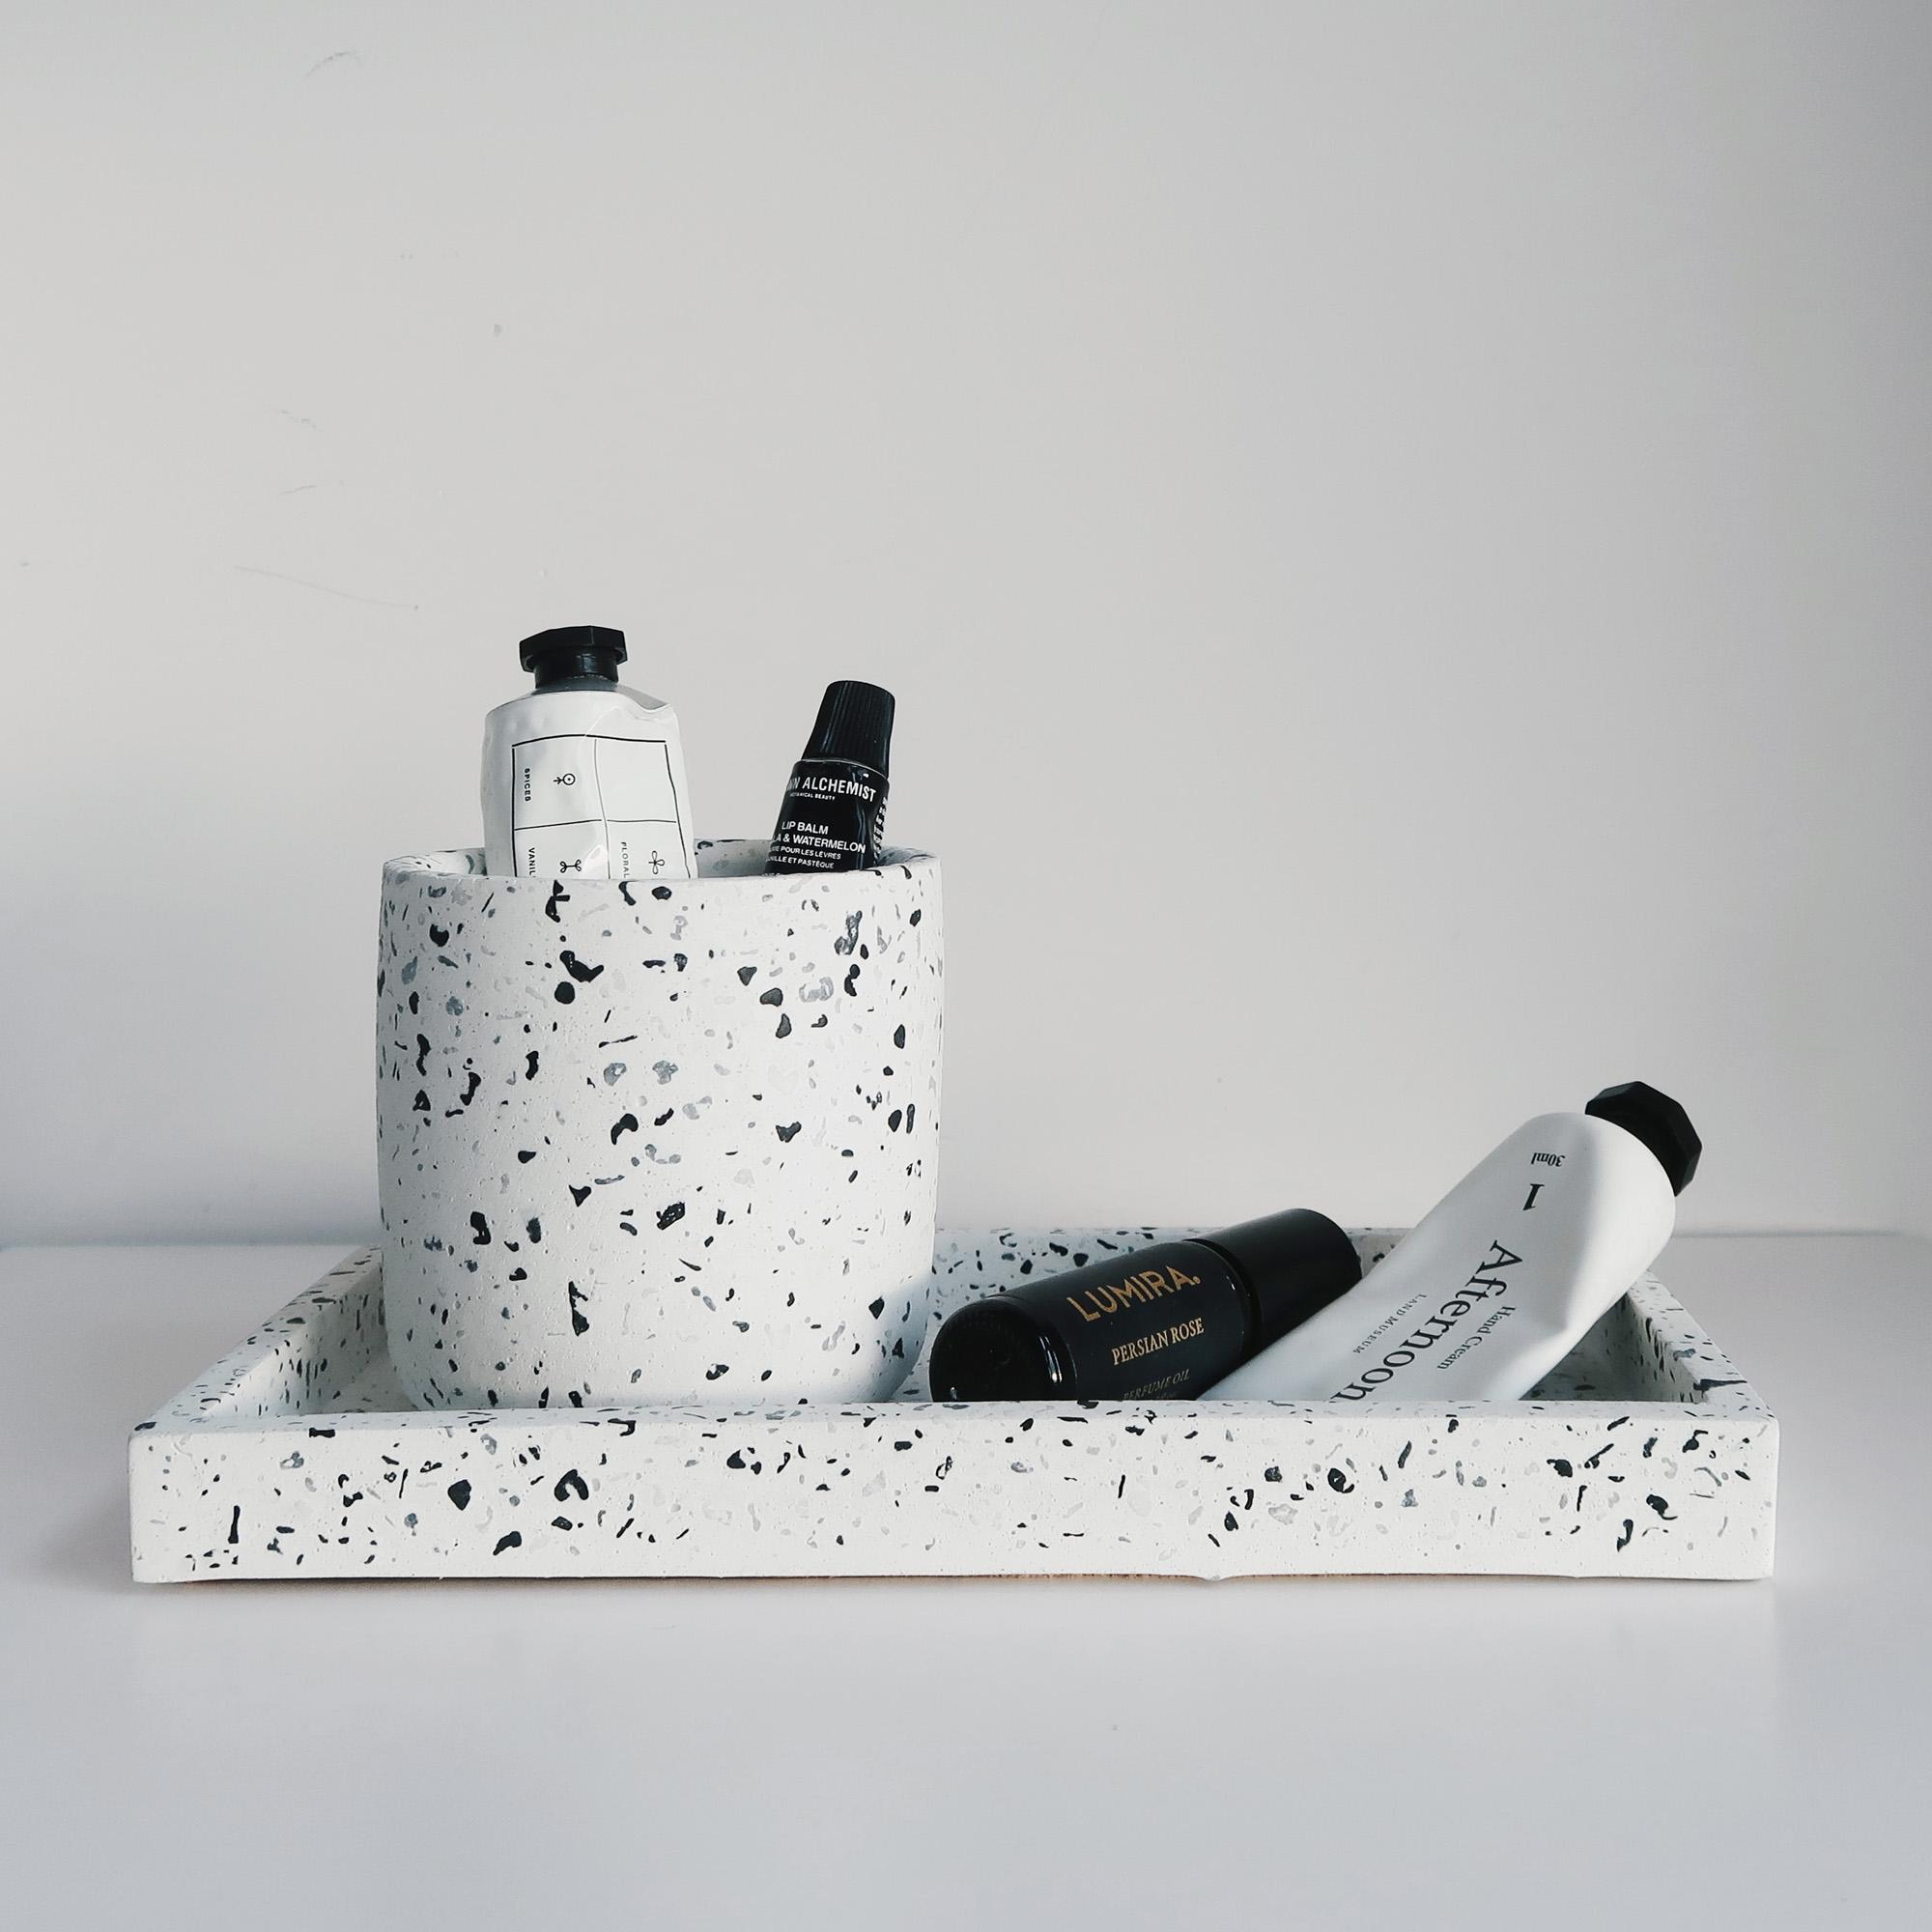 Terrazzo 磨石子經典黑白水泥收納罐・置物盆・禮物